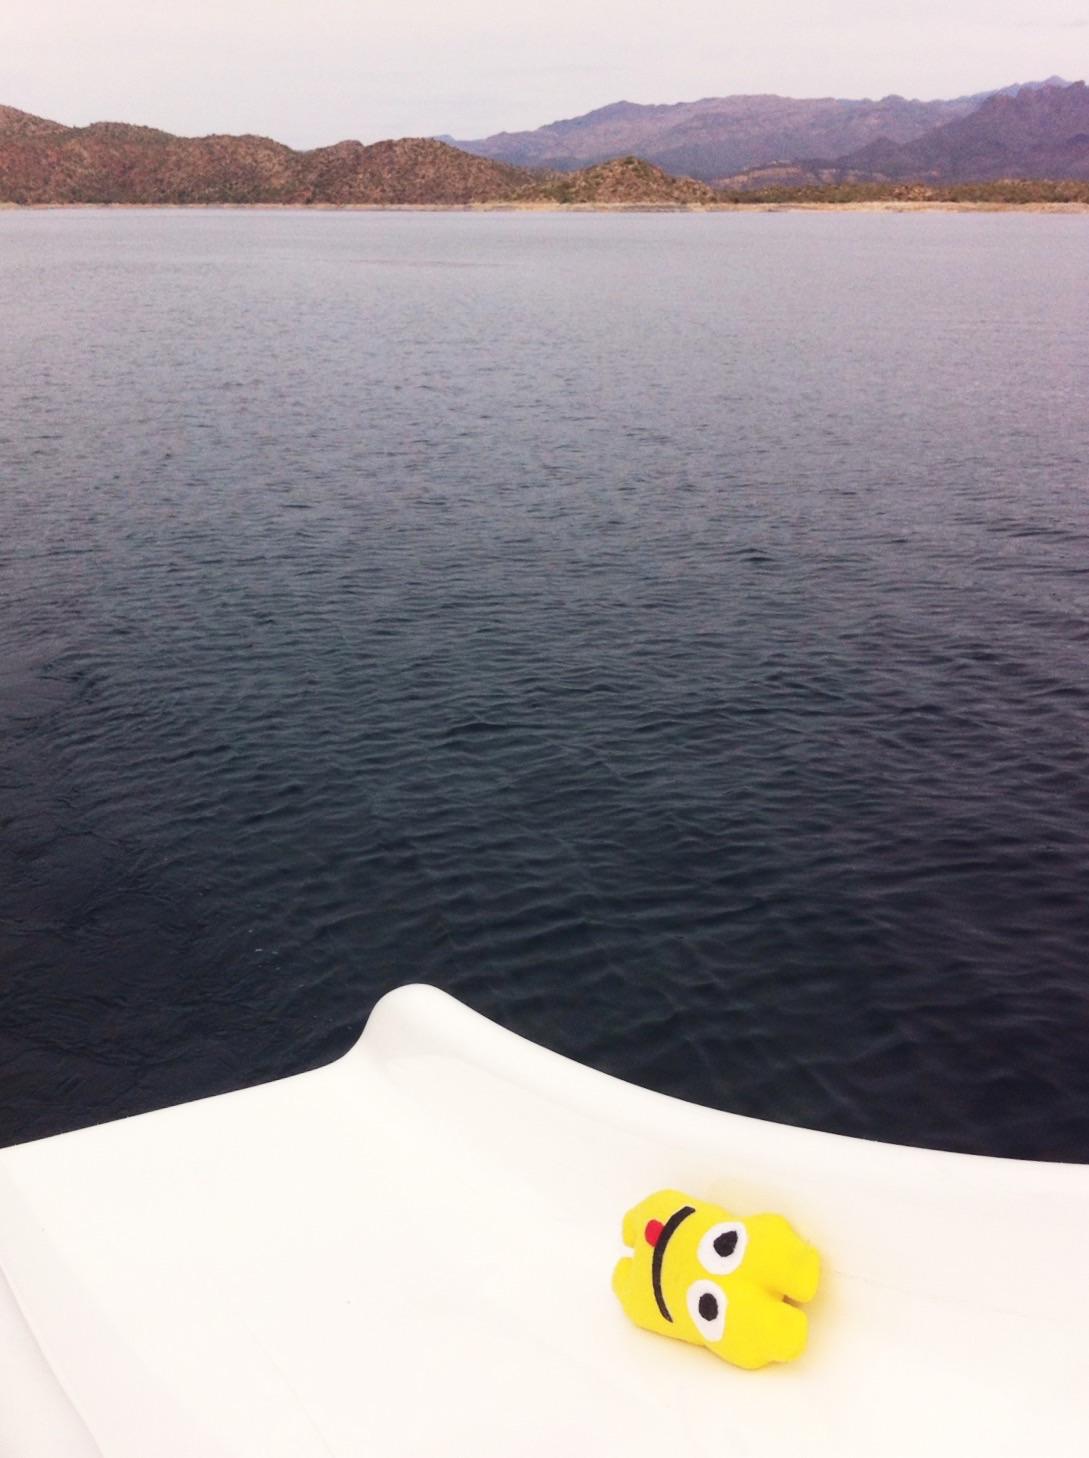 Bartlett Lake Marina Boat waterslide